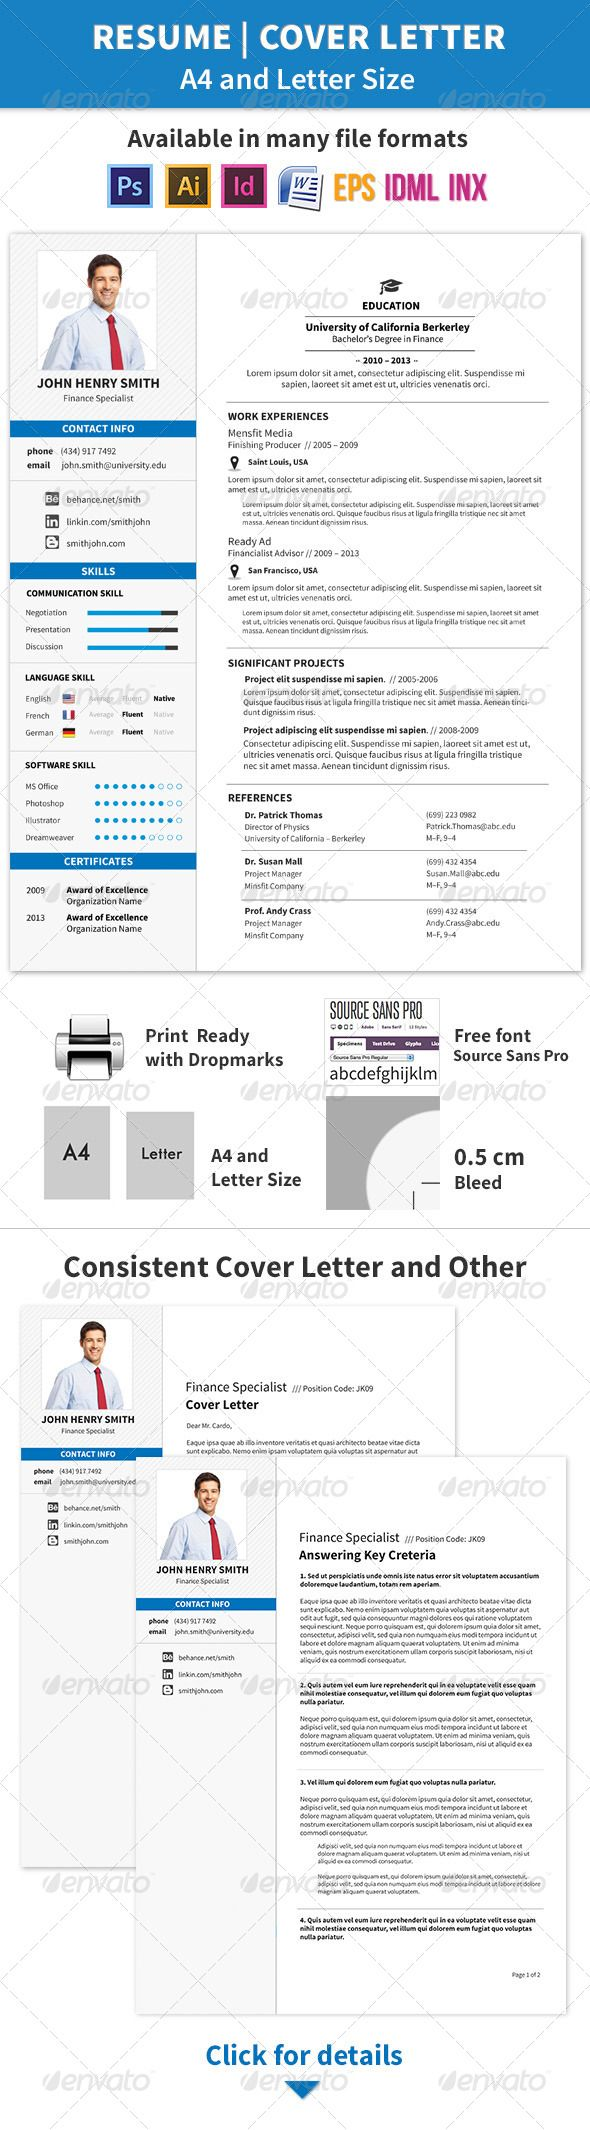 resume font size diepieche tk resume font size 16 04 2017